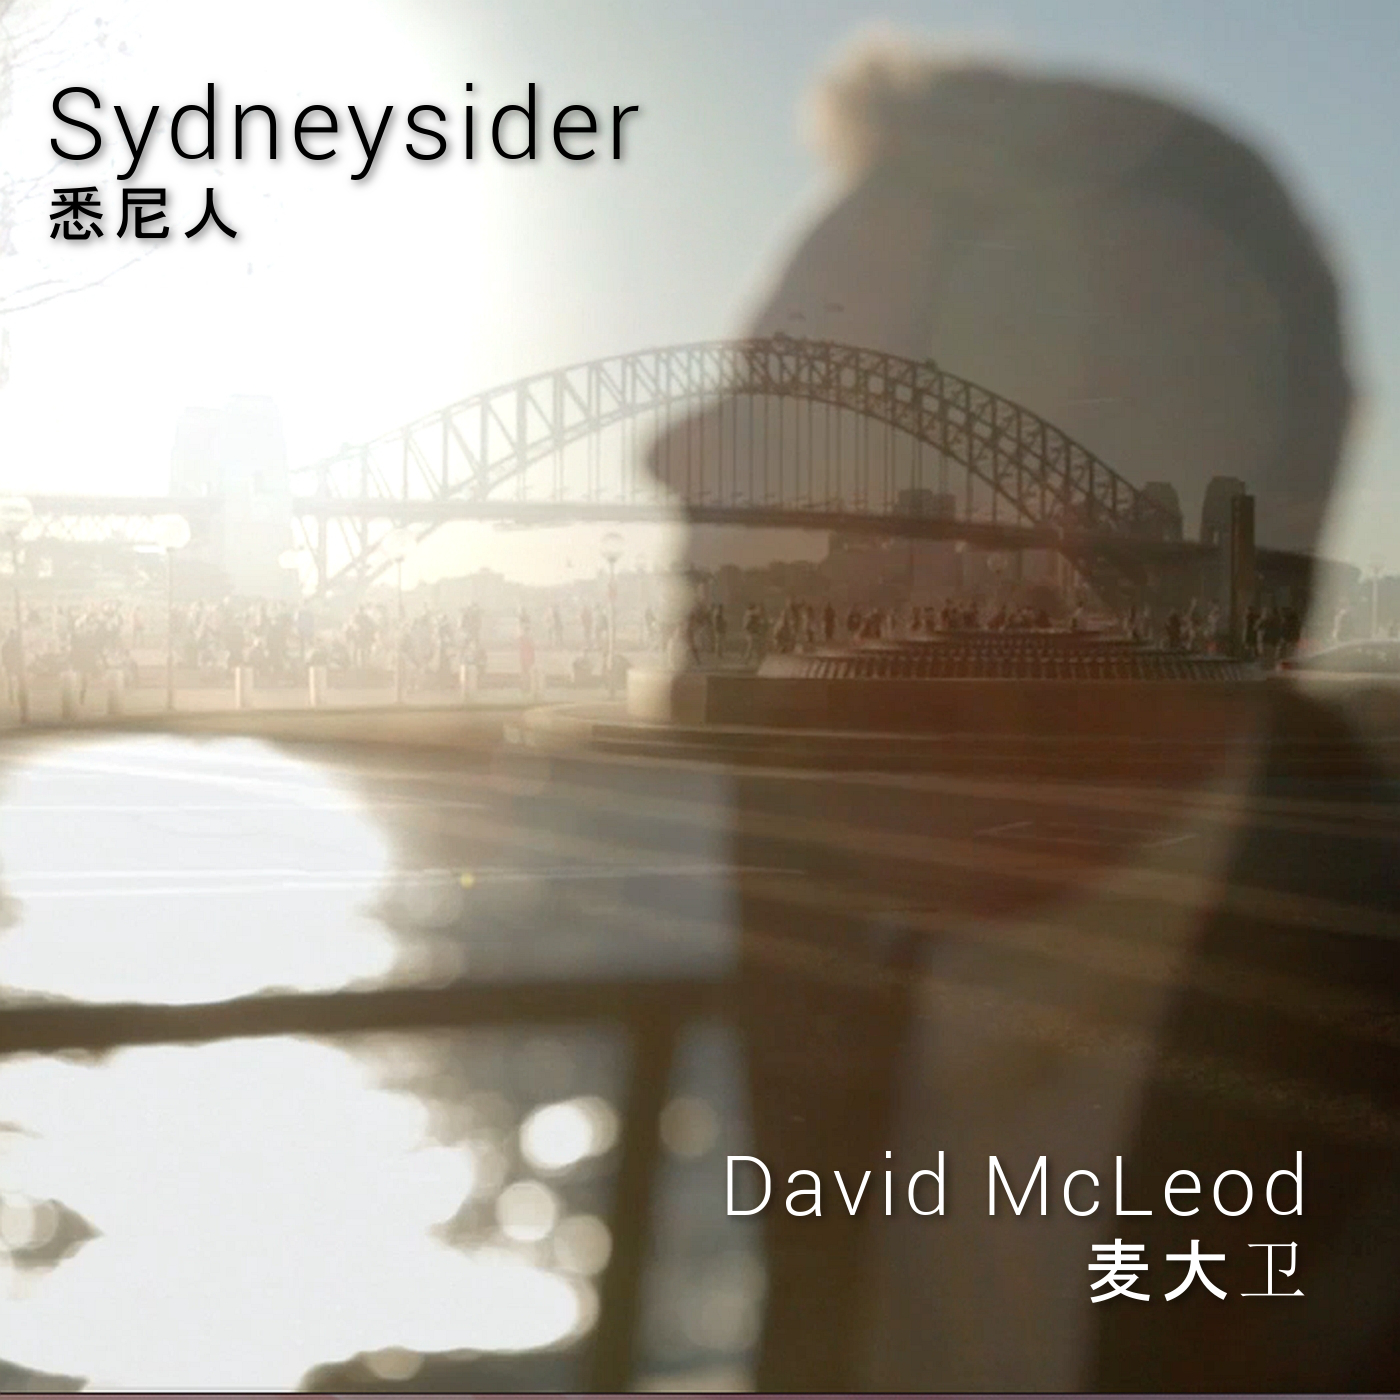 David McLeod Sydneysider